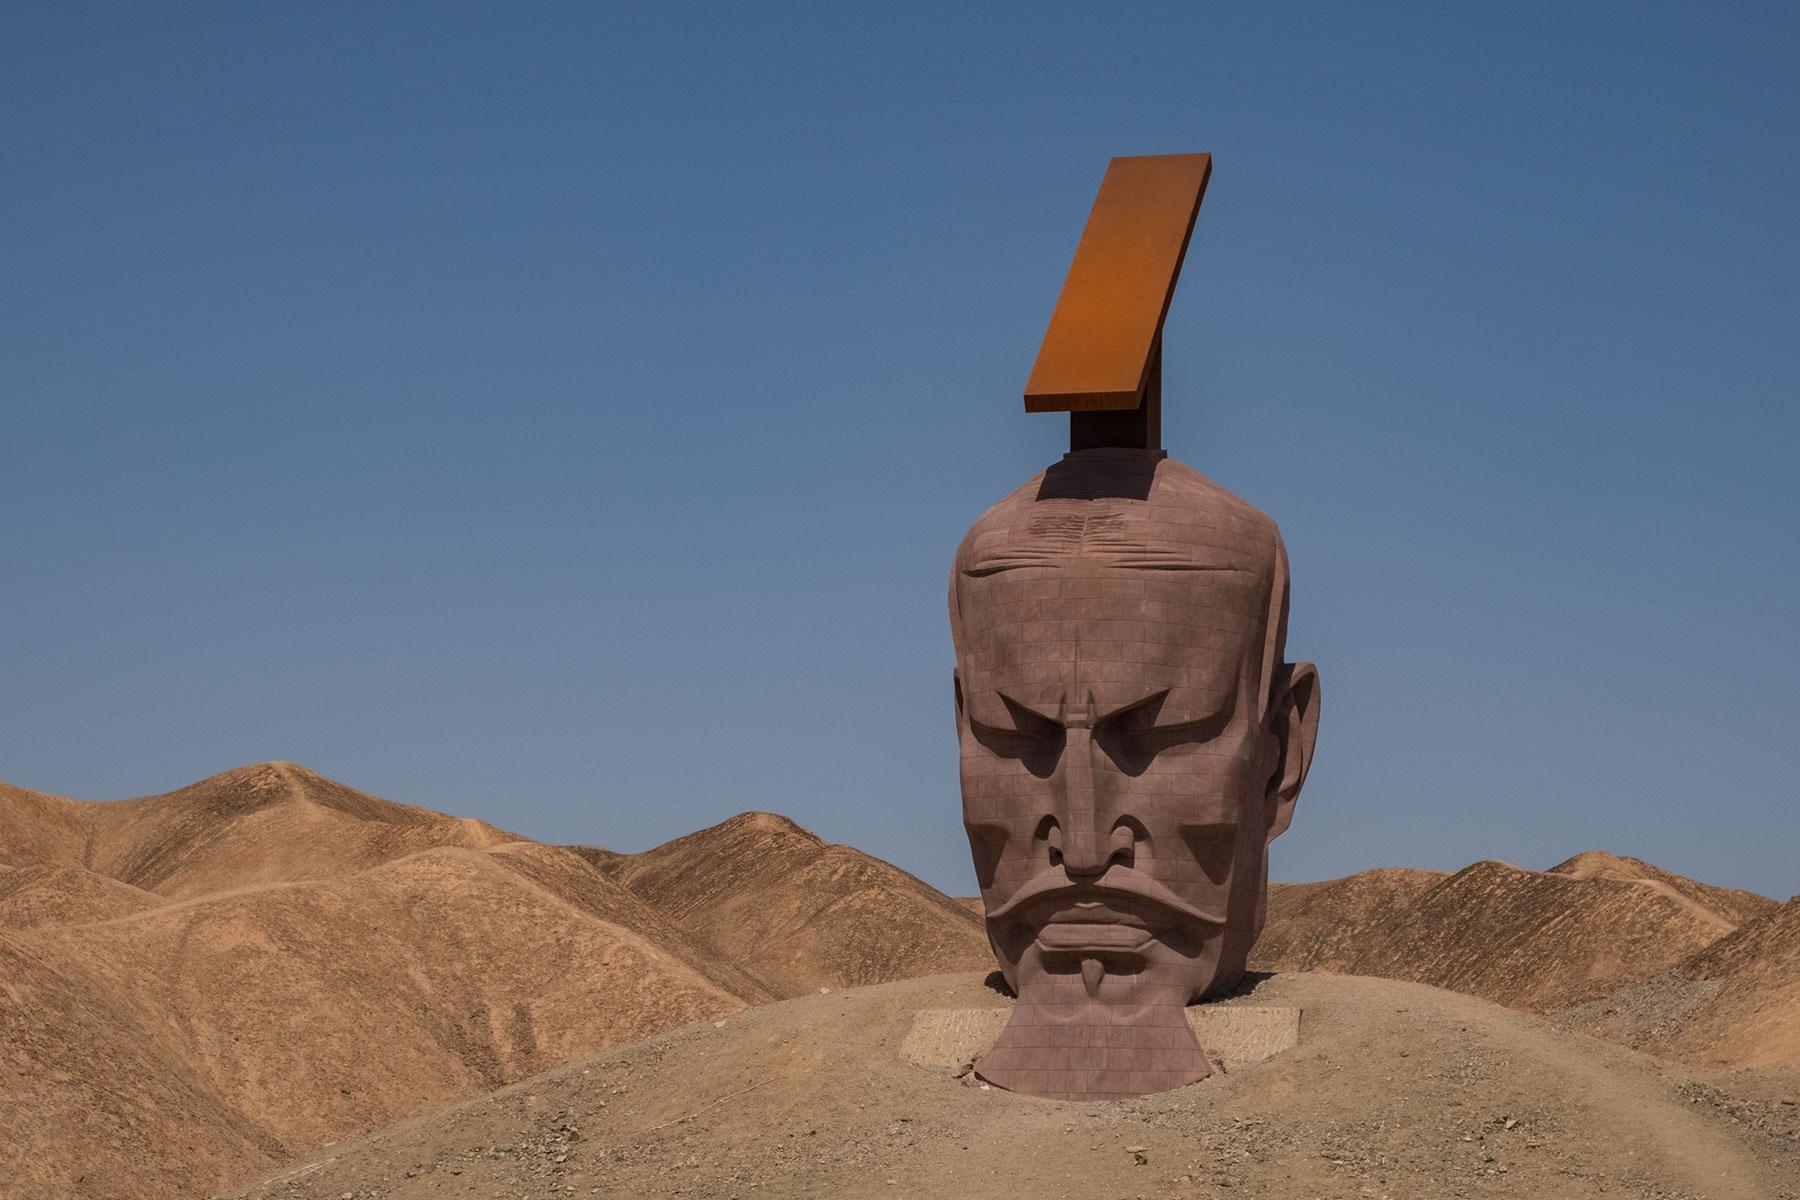 Kunstwerk Kopf in der Wüste in Gansu in China